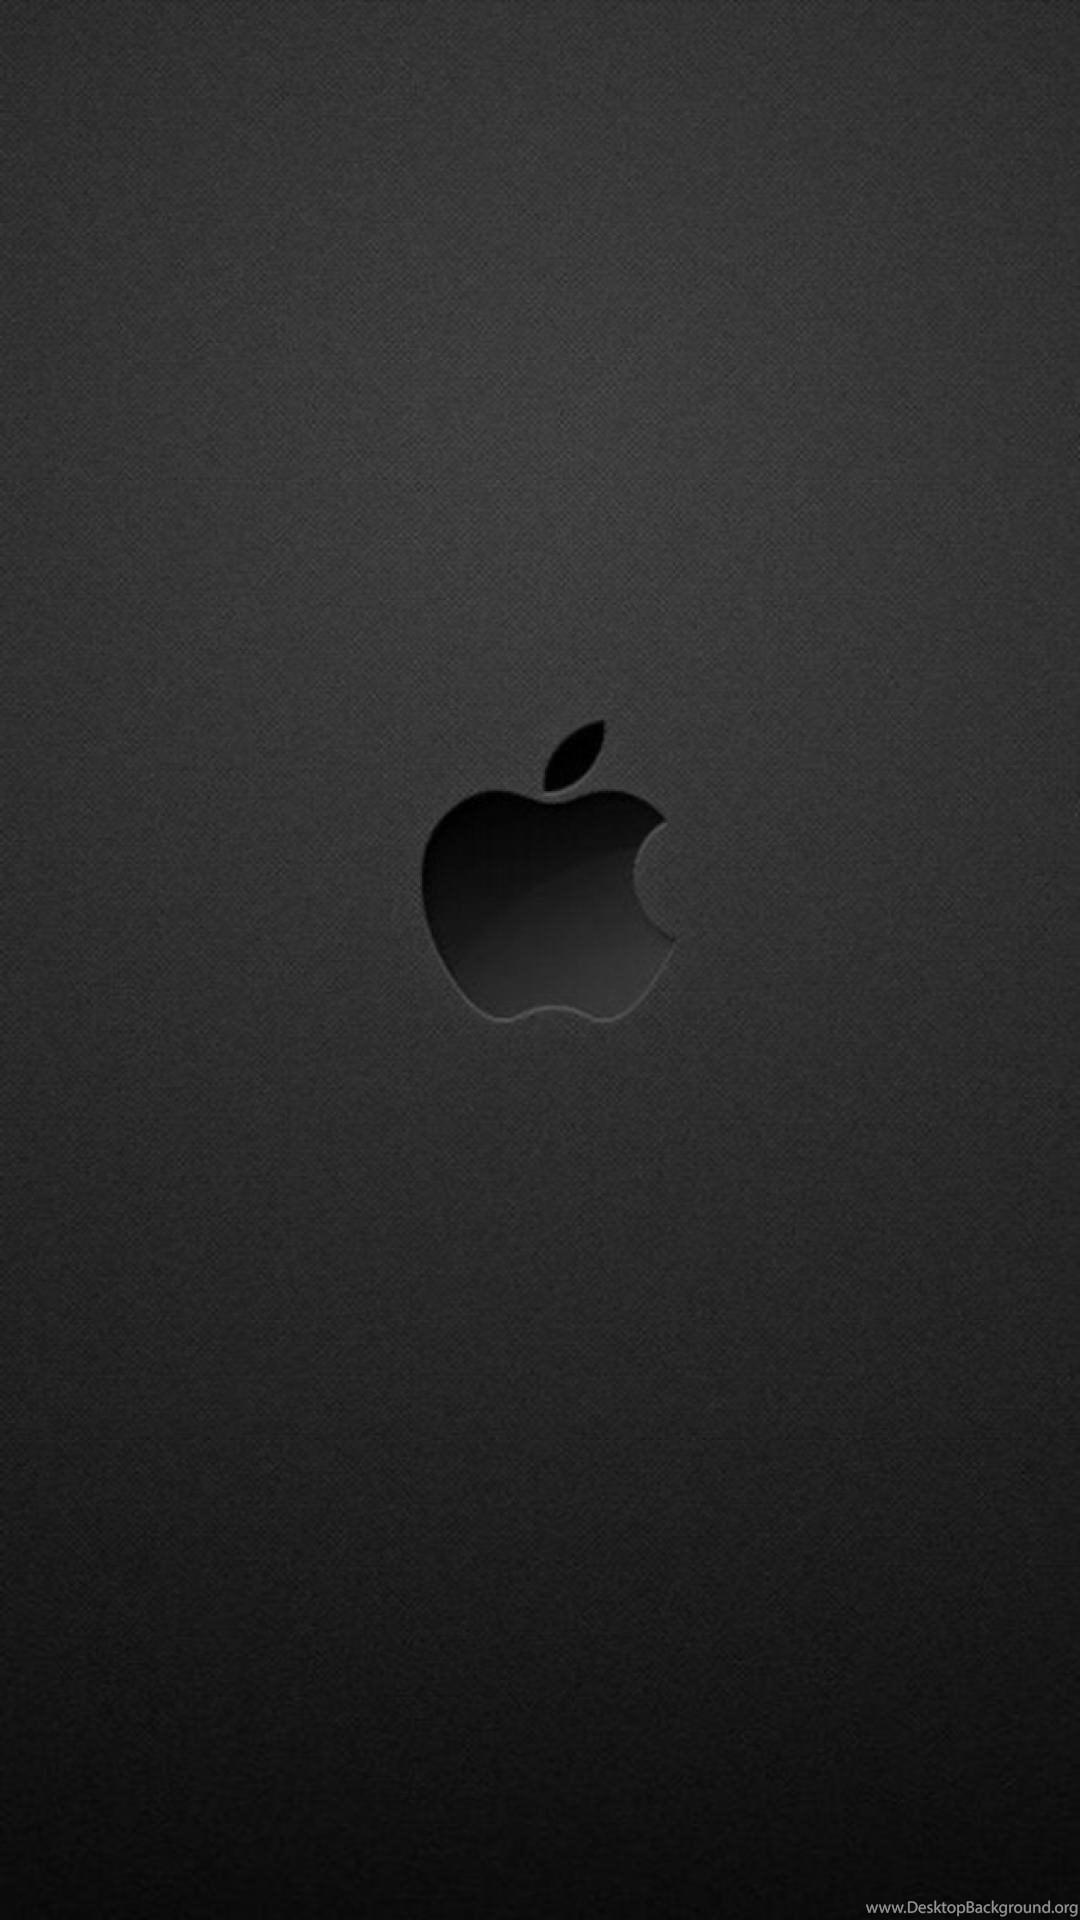 Iphone 6 Wallpapers Hd Retina HD WALLPAPER Desktop Background